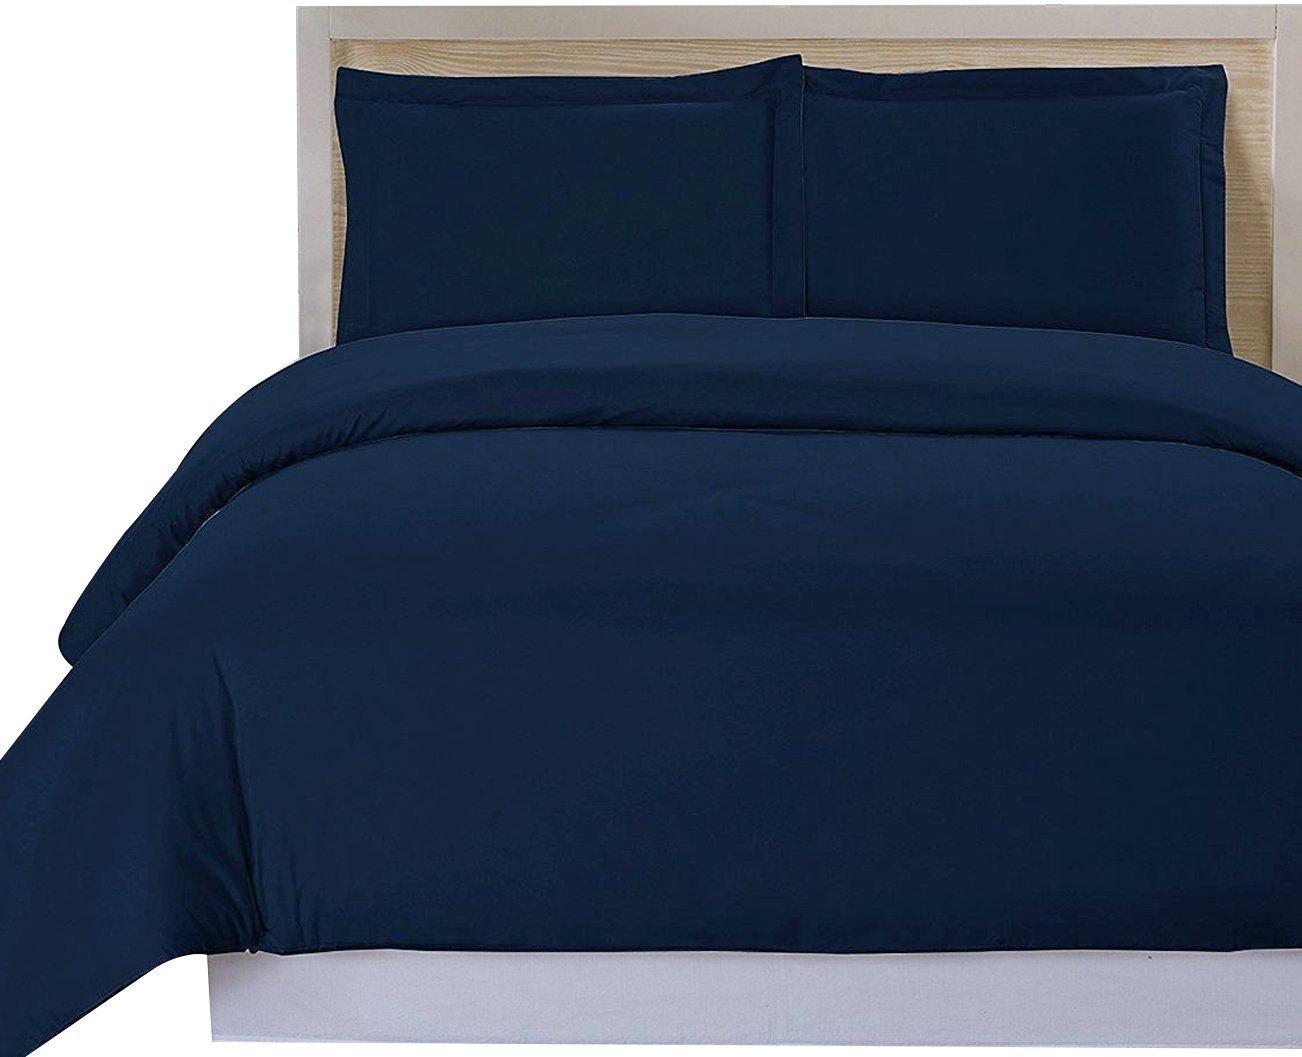 Utopia Bedding 3 Piece King Duvet Cover Set with 2 Pillow Shams, Navy